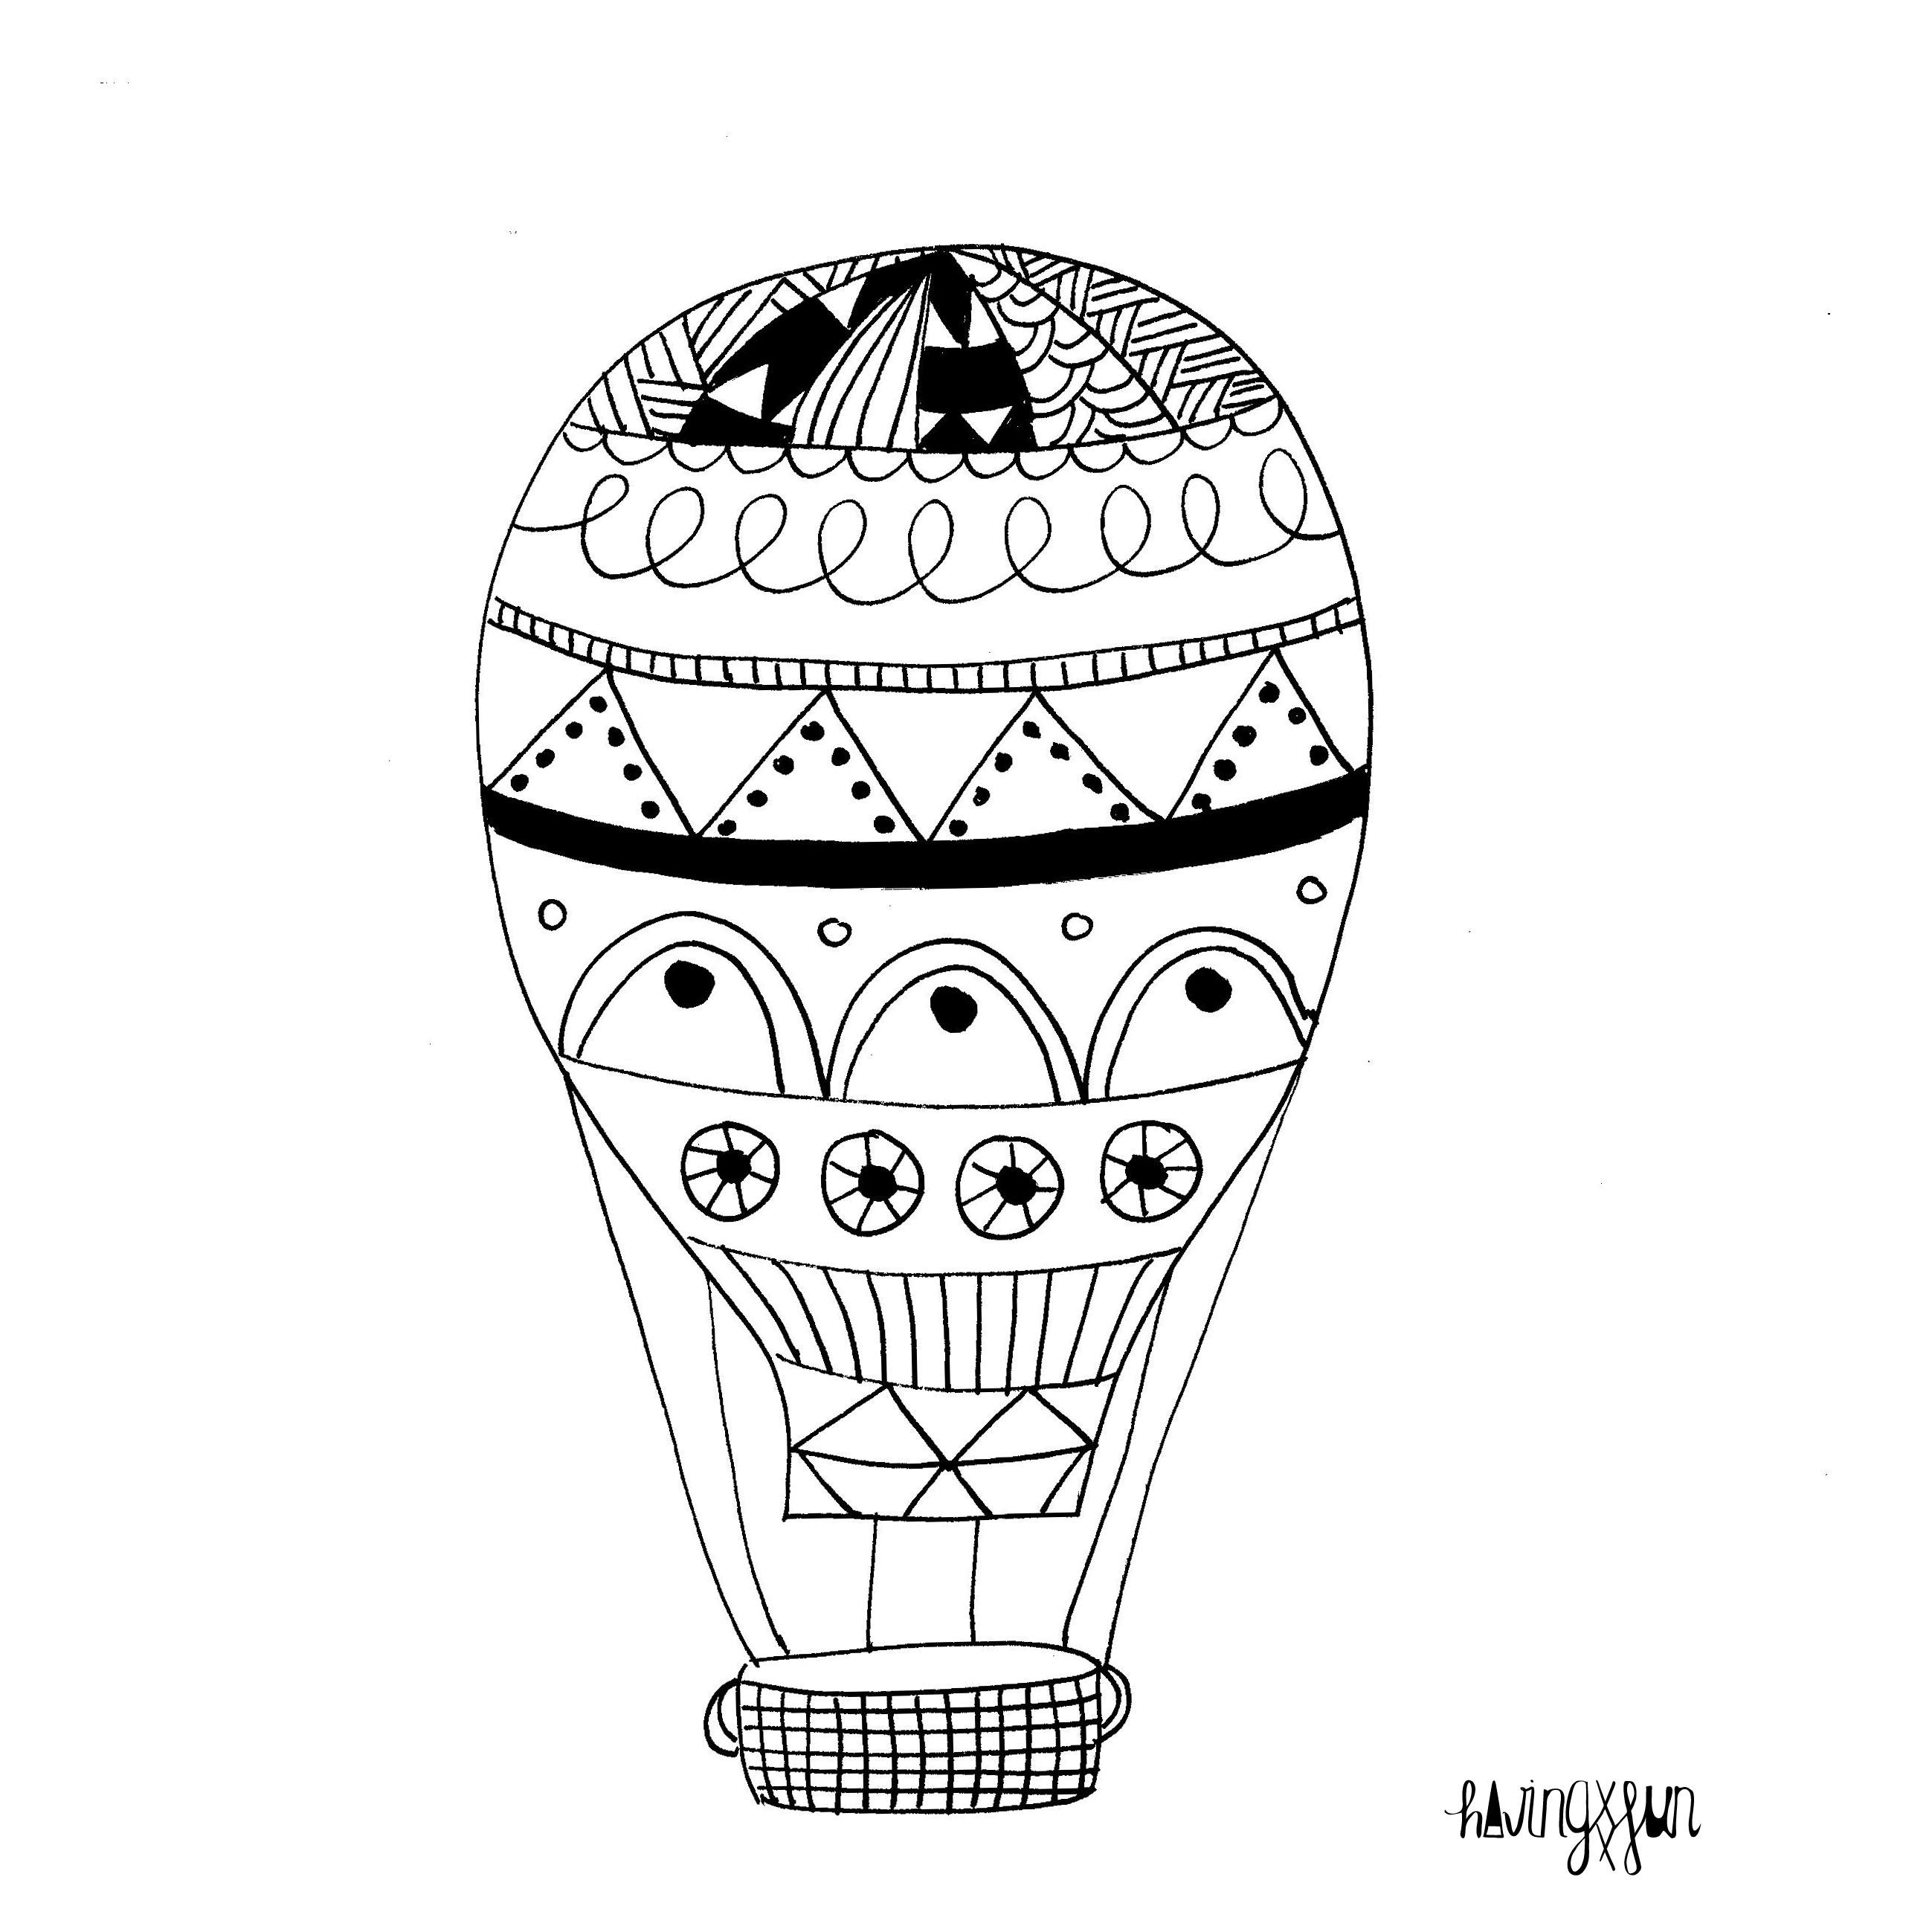 retos creativos doodling